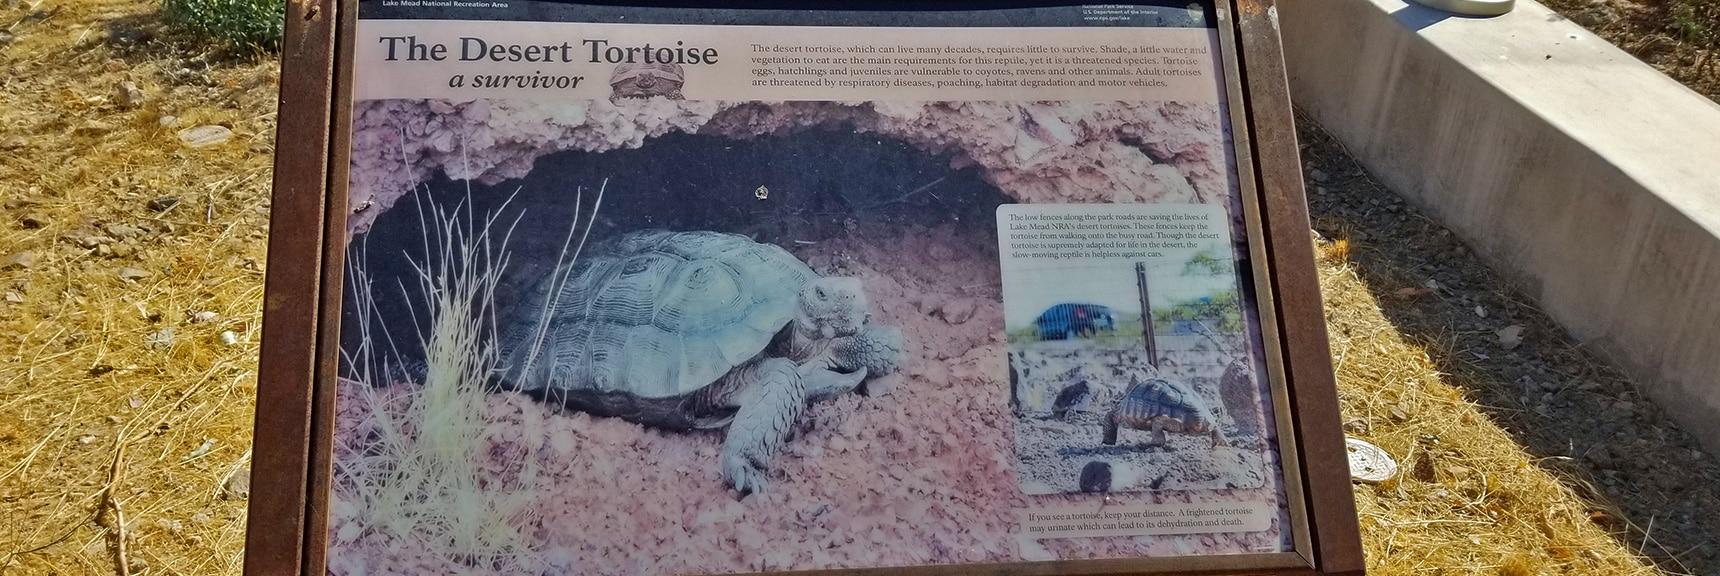 Interpretive Display of Desert Tortoise Life Around the Lake Mead Area   Callville Summit Trail   Lake Mead National Recreation Area, Nevada